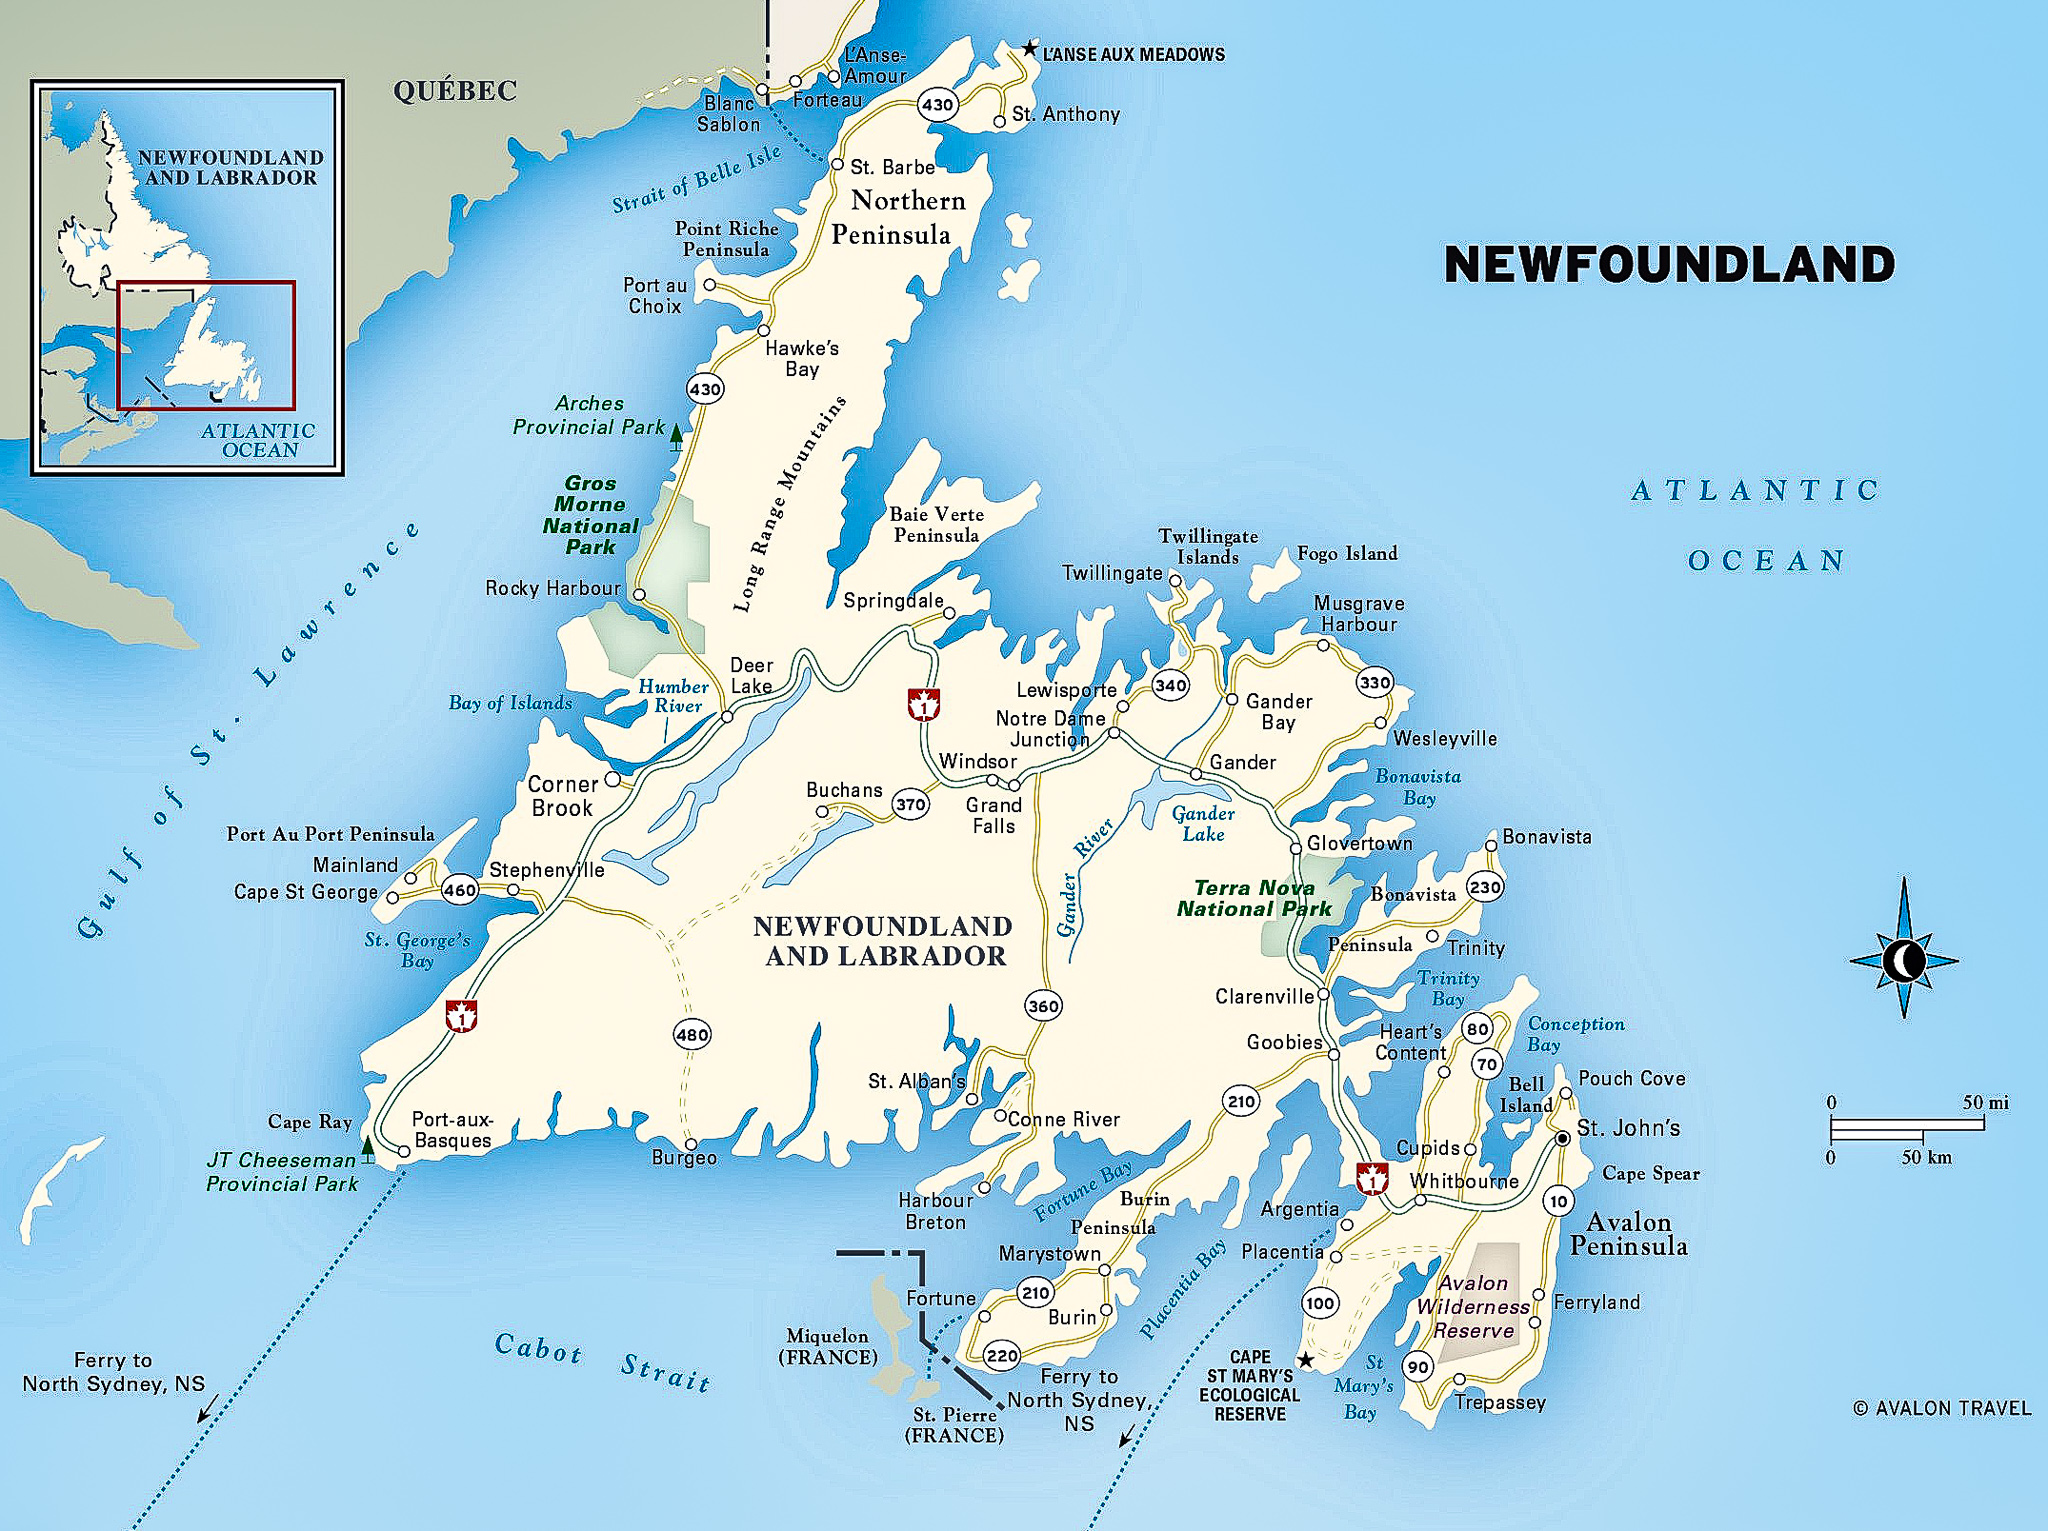 00_04_Newfoundland-2.jpg